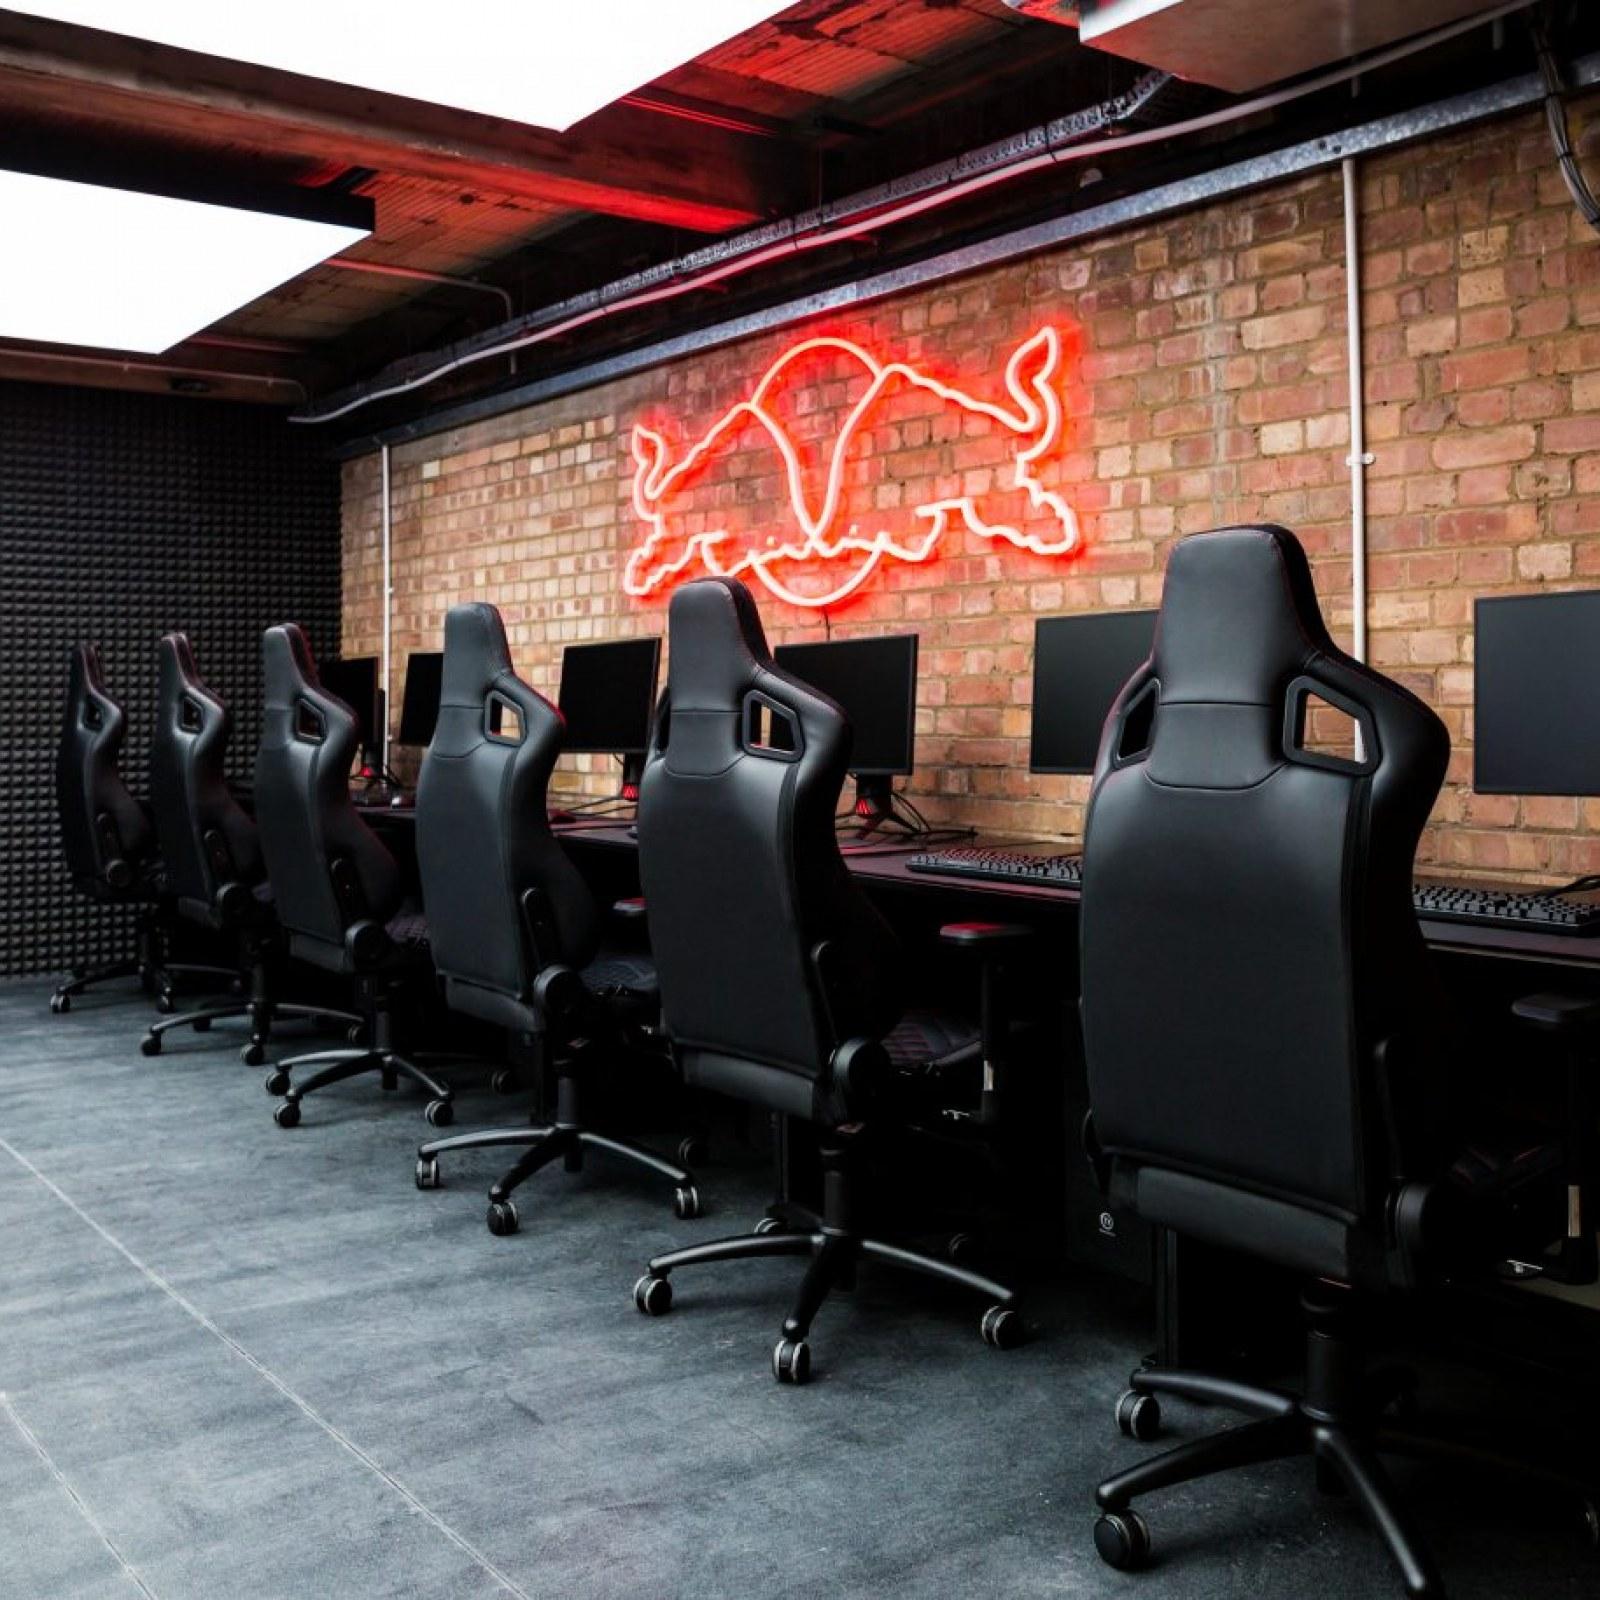 Marvelous League Of Legends World Championship How Team Liquid G2 Evergreenethics Interior Chair Design Evergreenethicsorg